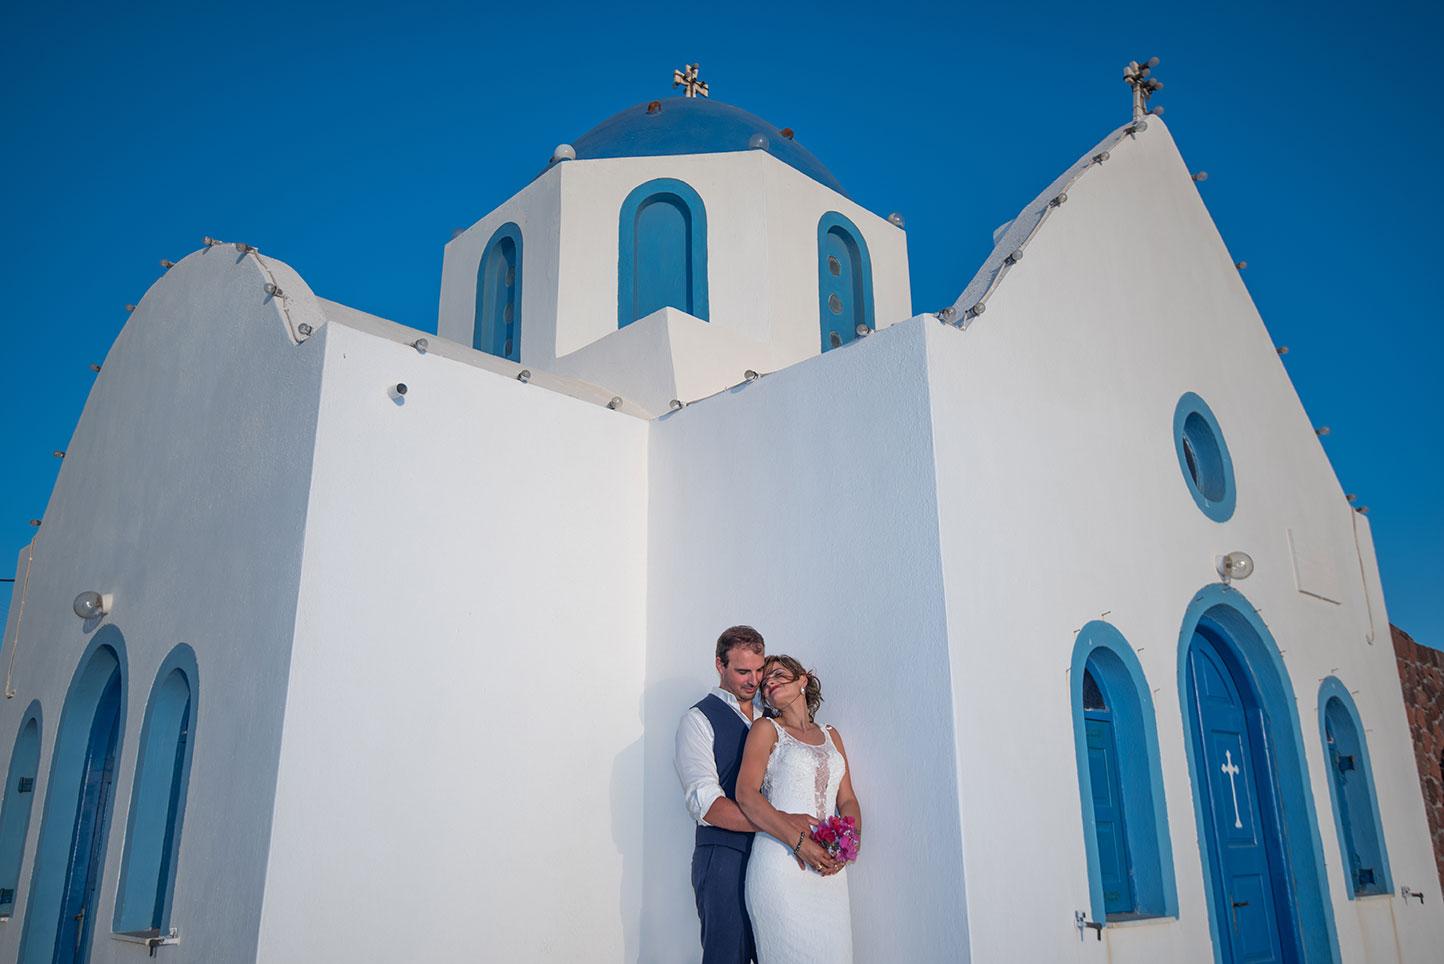 2018-06-12-mariage-santorin-766b